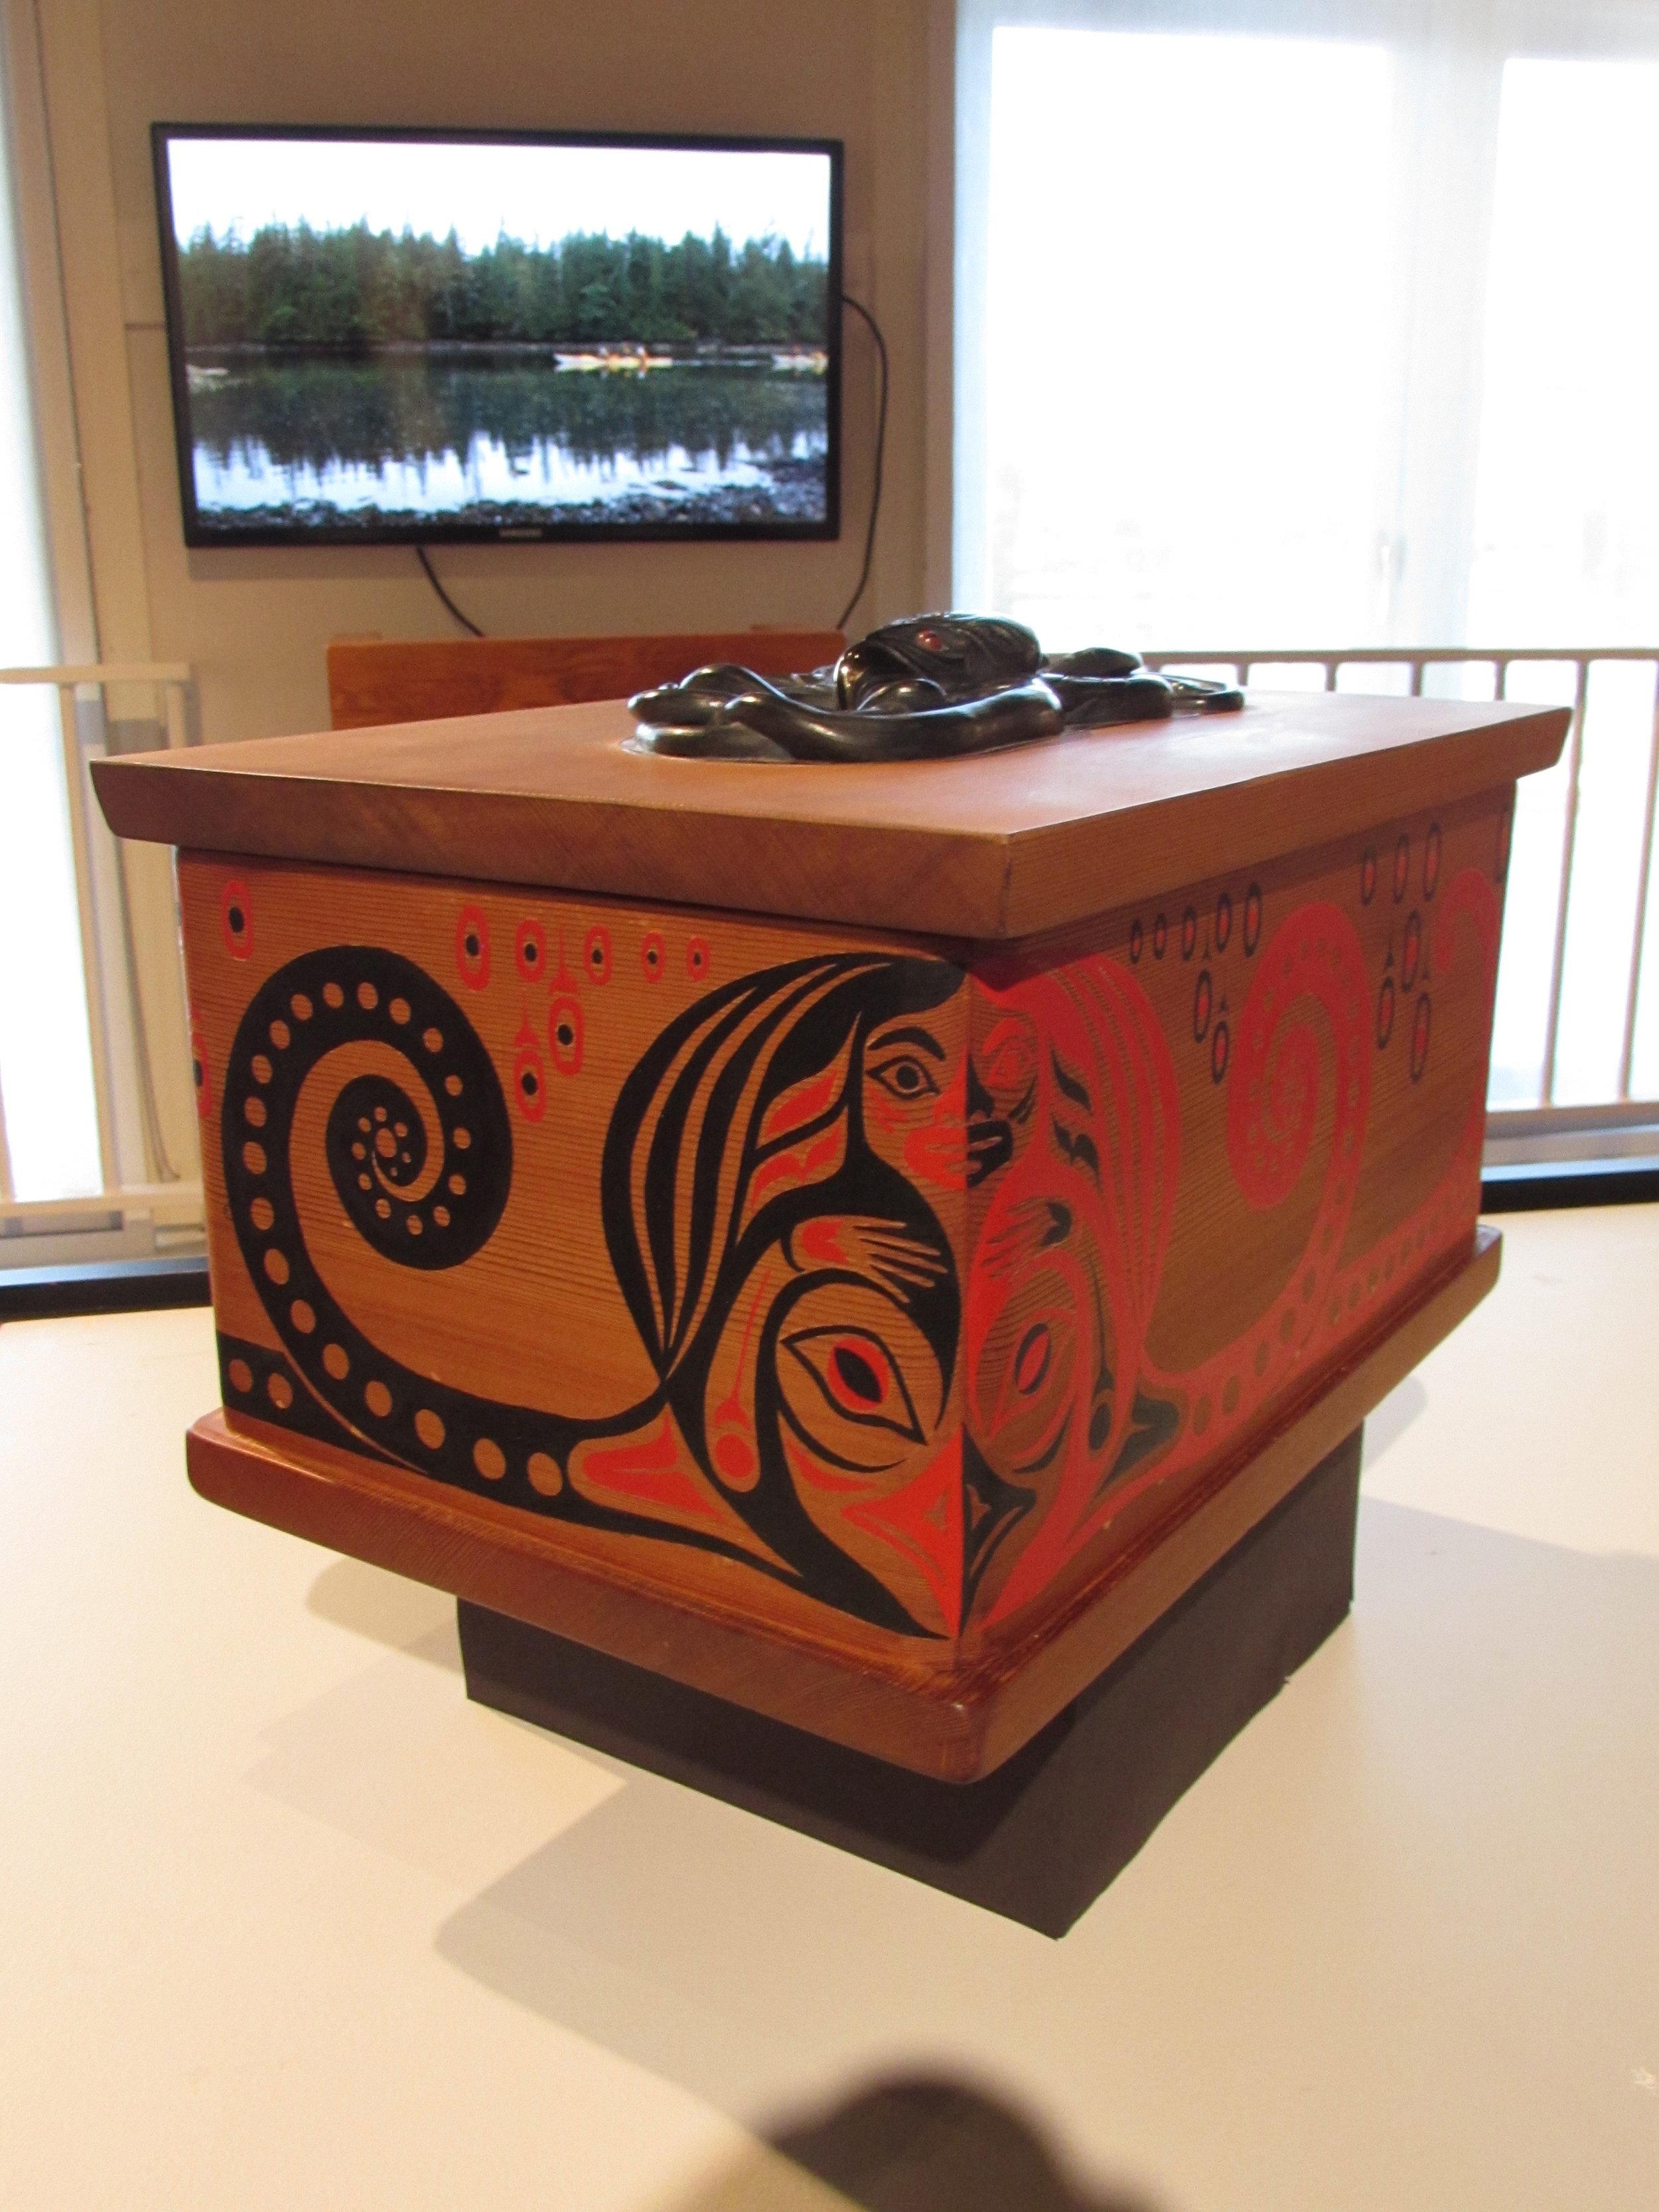 April SGaana Jaad White, Octopus Woman bentwood box with argillite